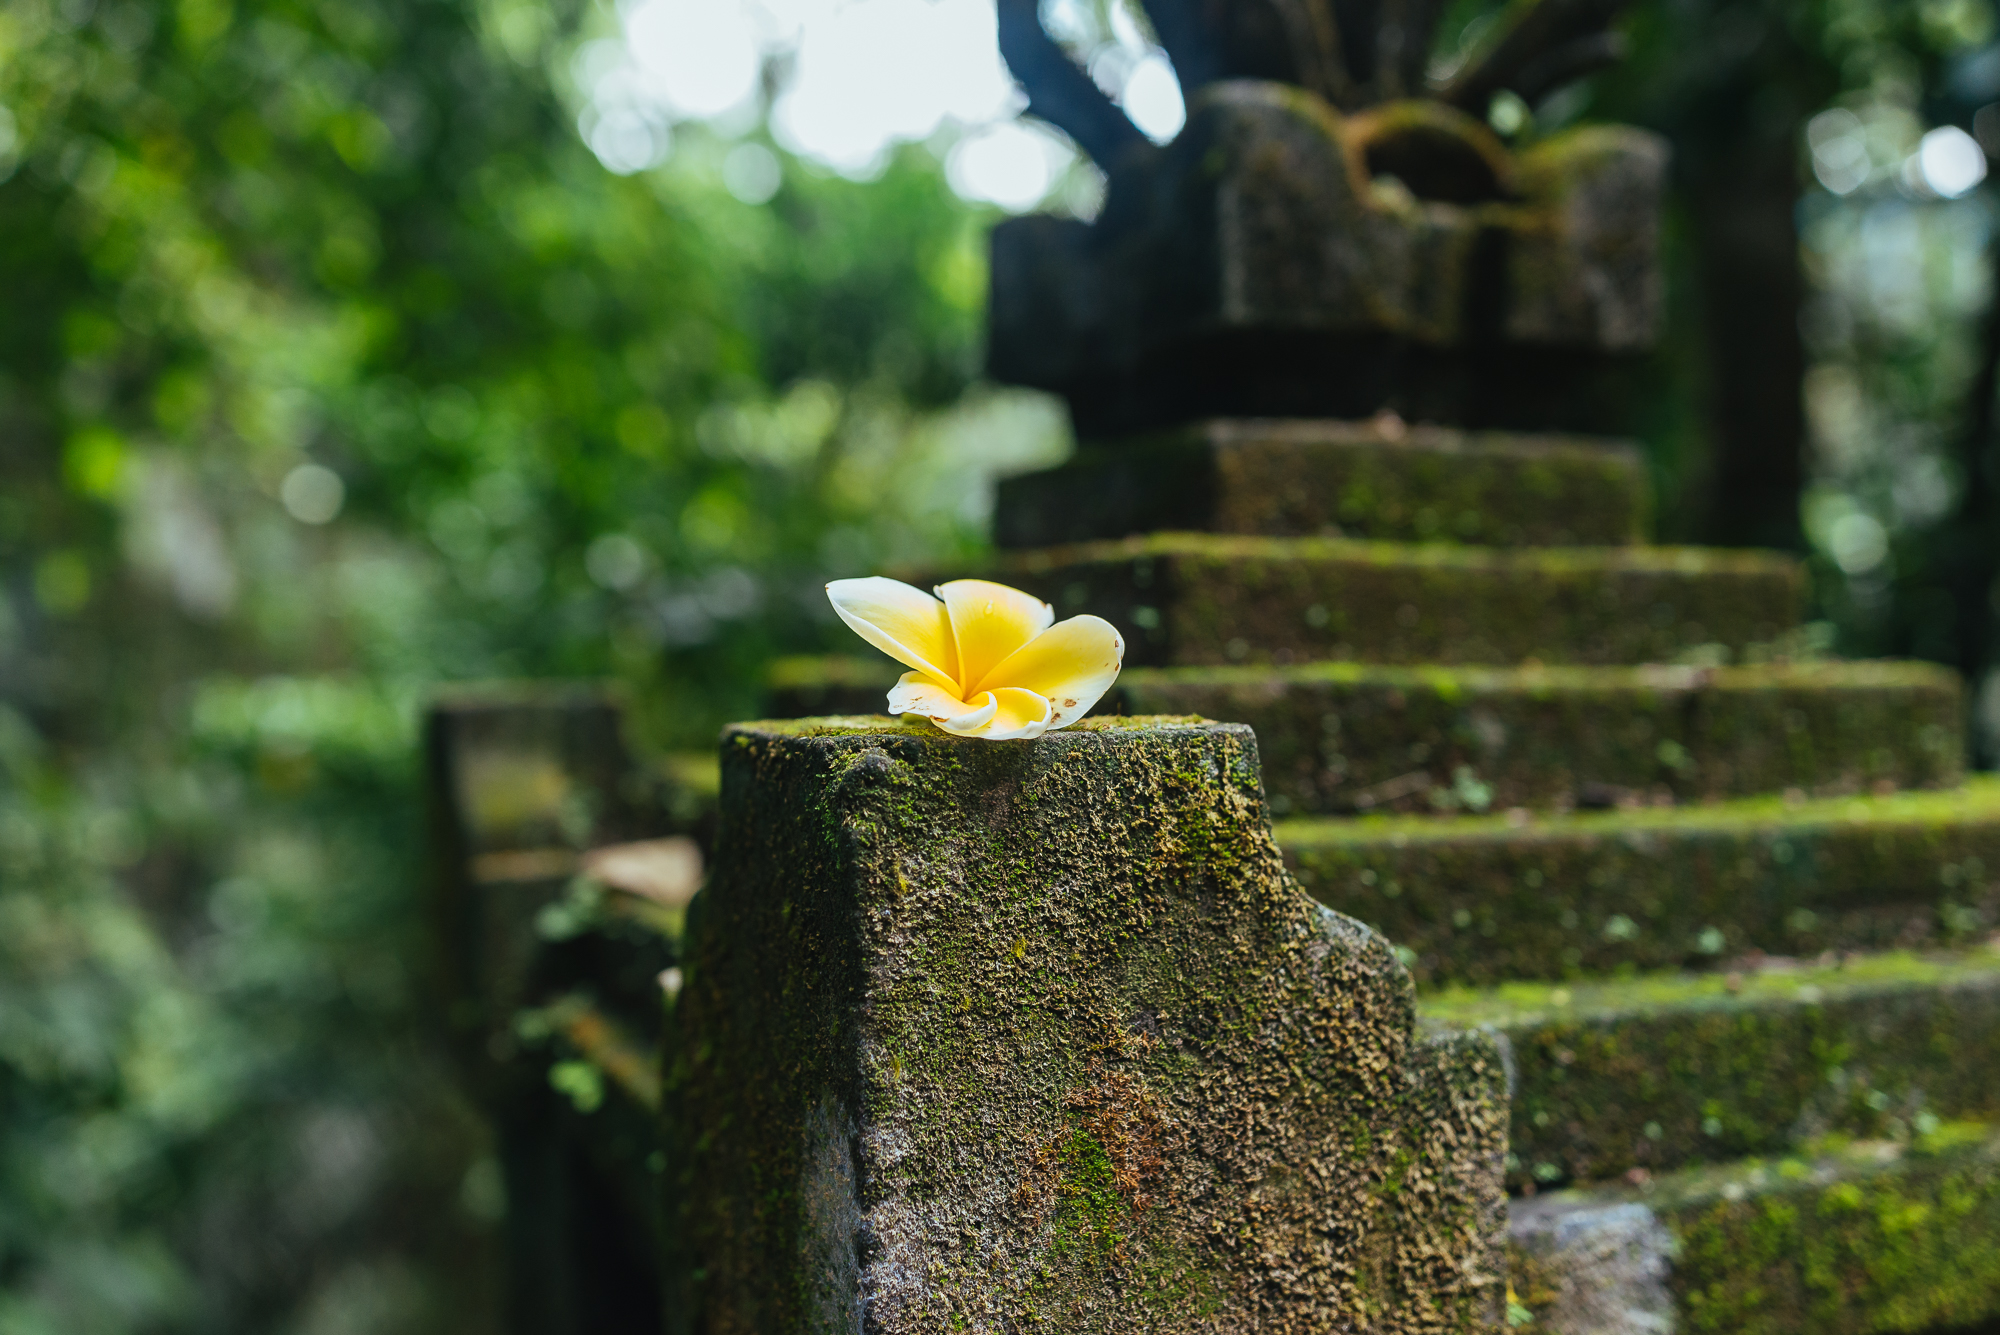 indonesia_2017-450.jpg